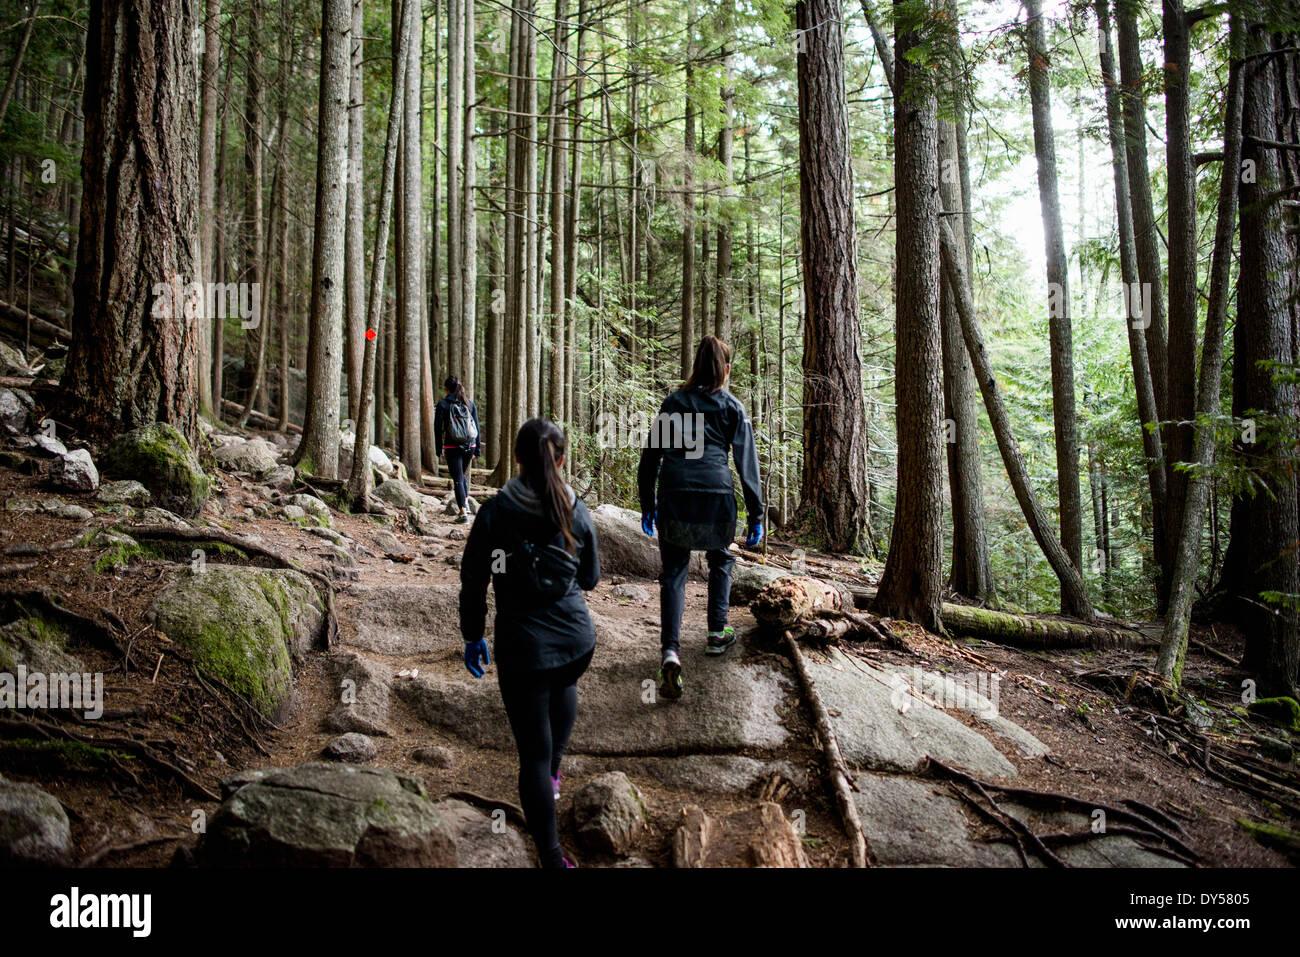 Drei junge weibliche Wanderer im Wald, Squamish, British Columbia, Kanada Stockbild